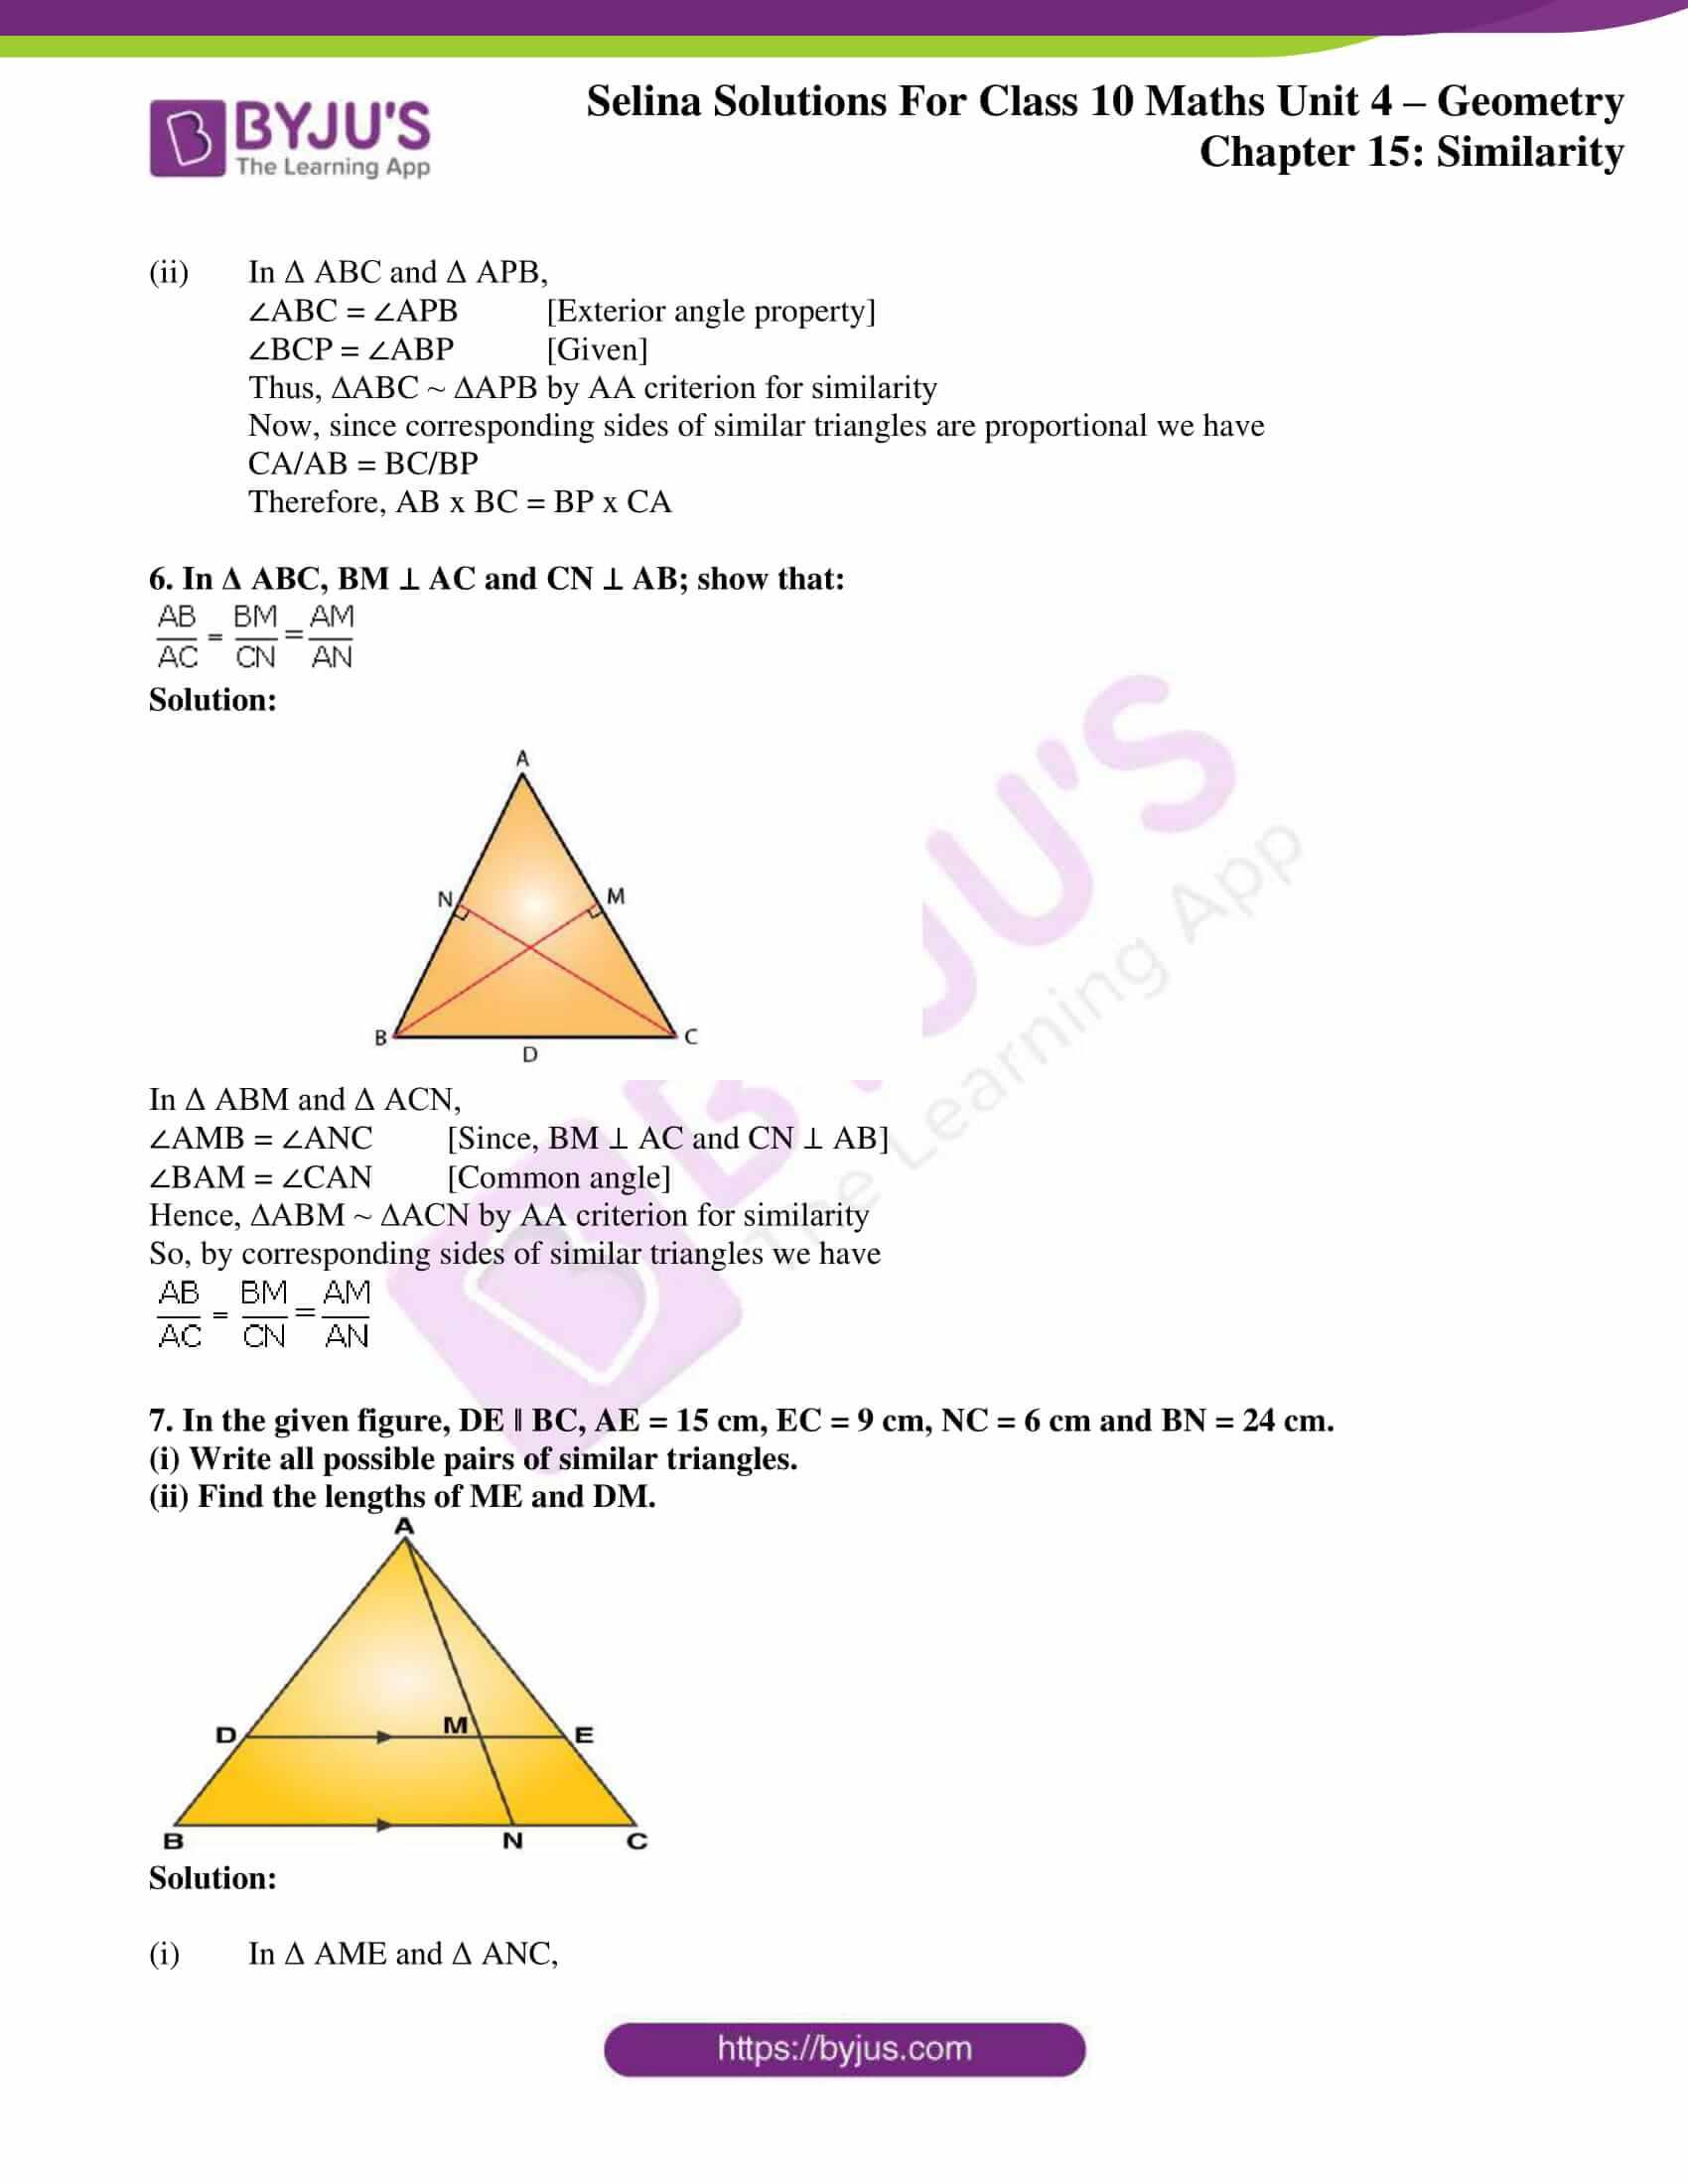 selina-sol-maths-class-10-ch-15-ex-a-4